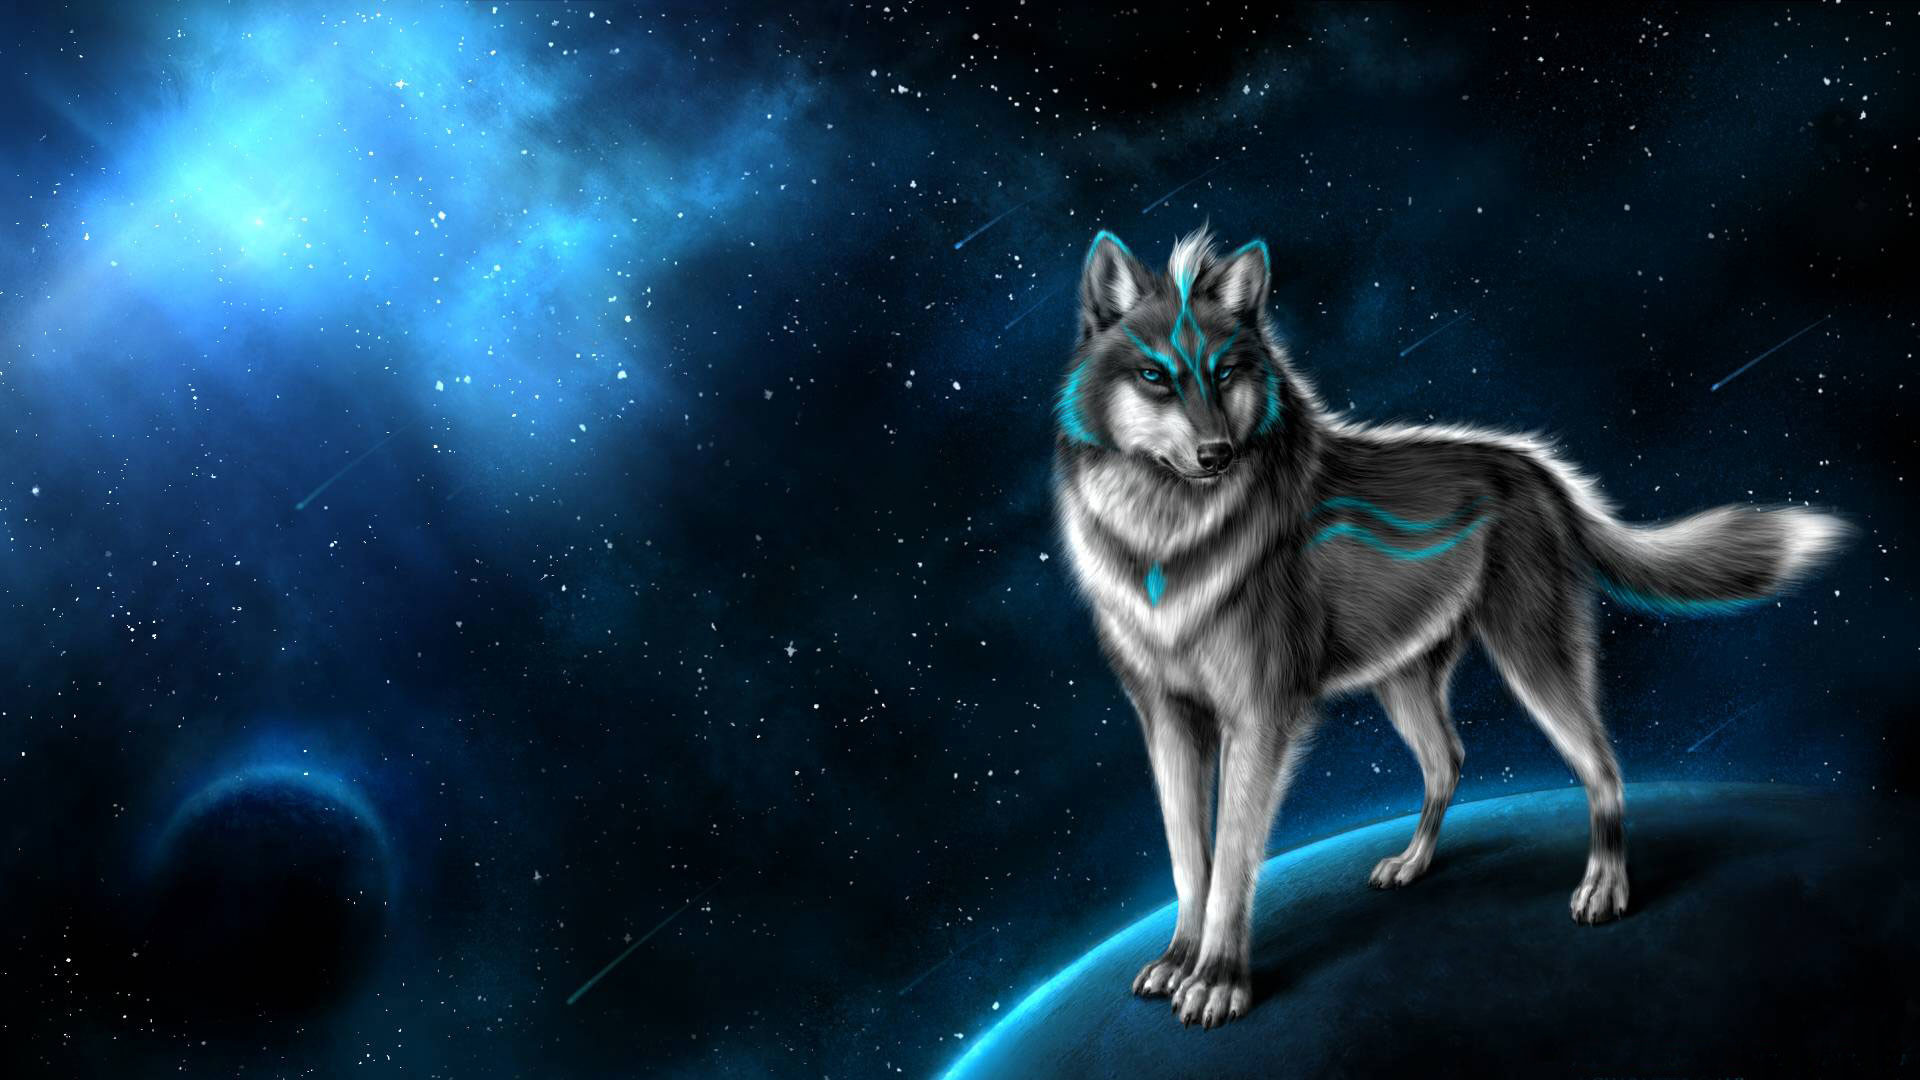 Hd Pics Photos Attractive Best Fox Animated Neon Blue Light Nebula Stars Planet Hd Quality Desktop